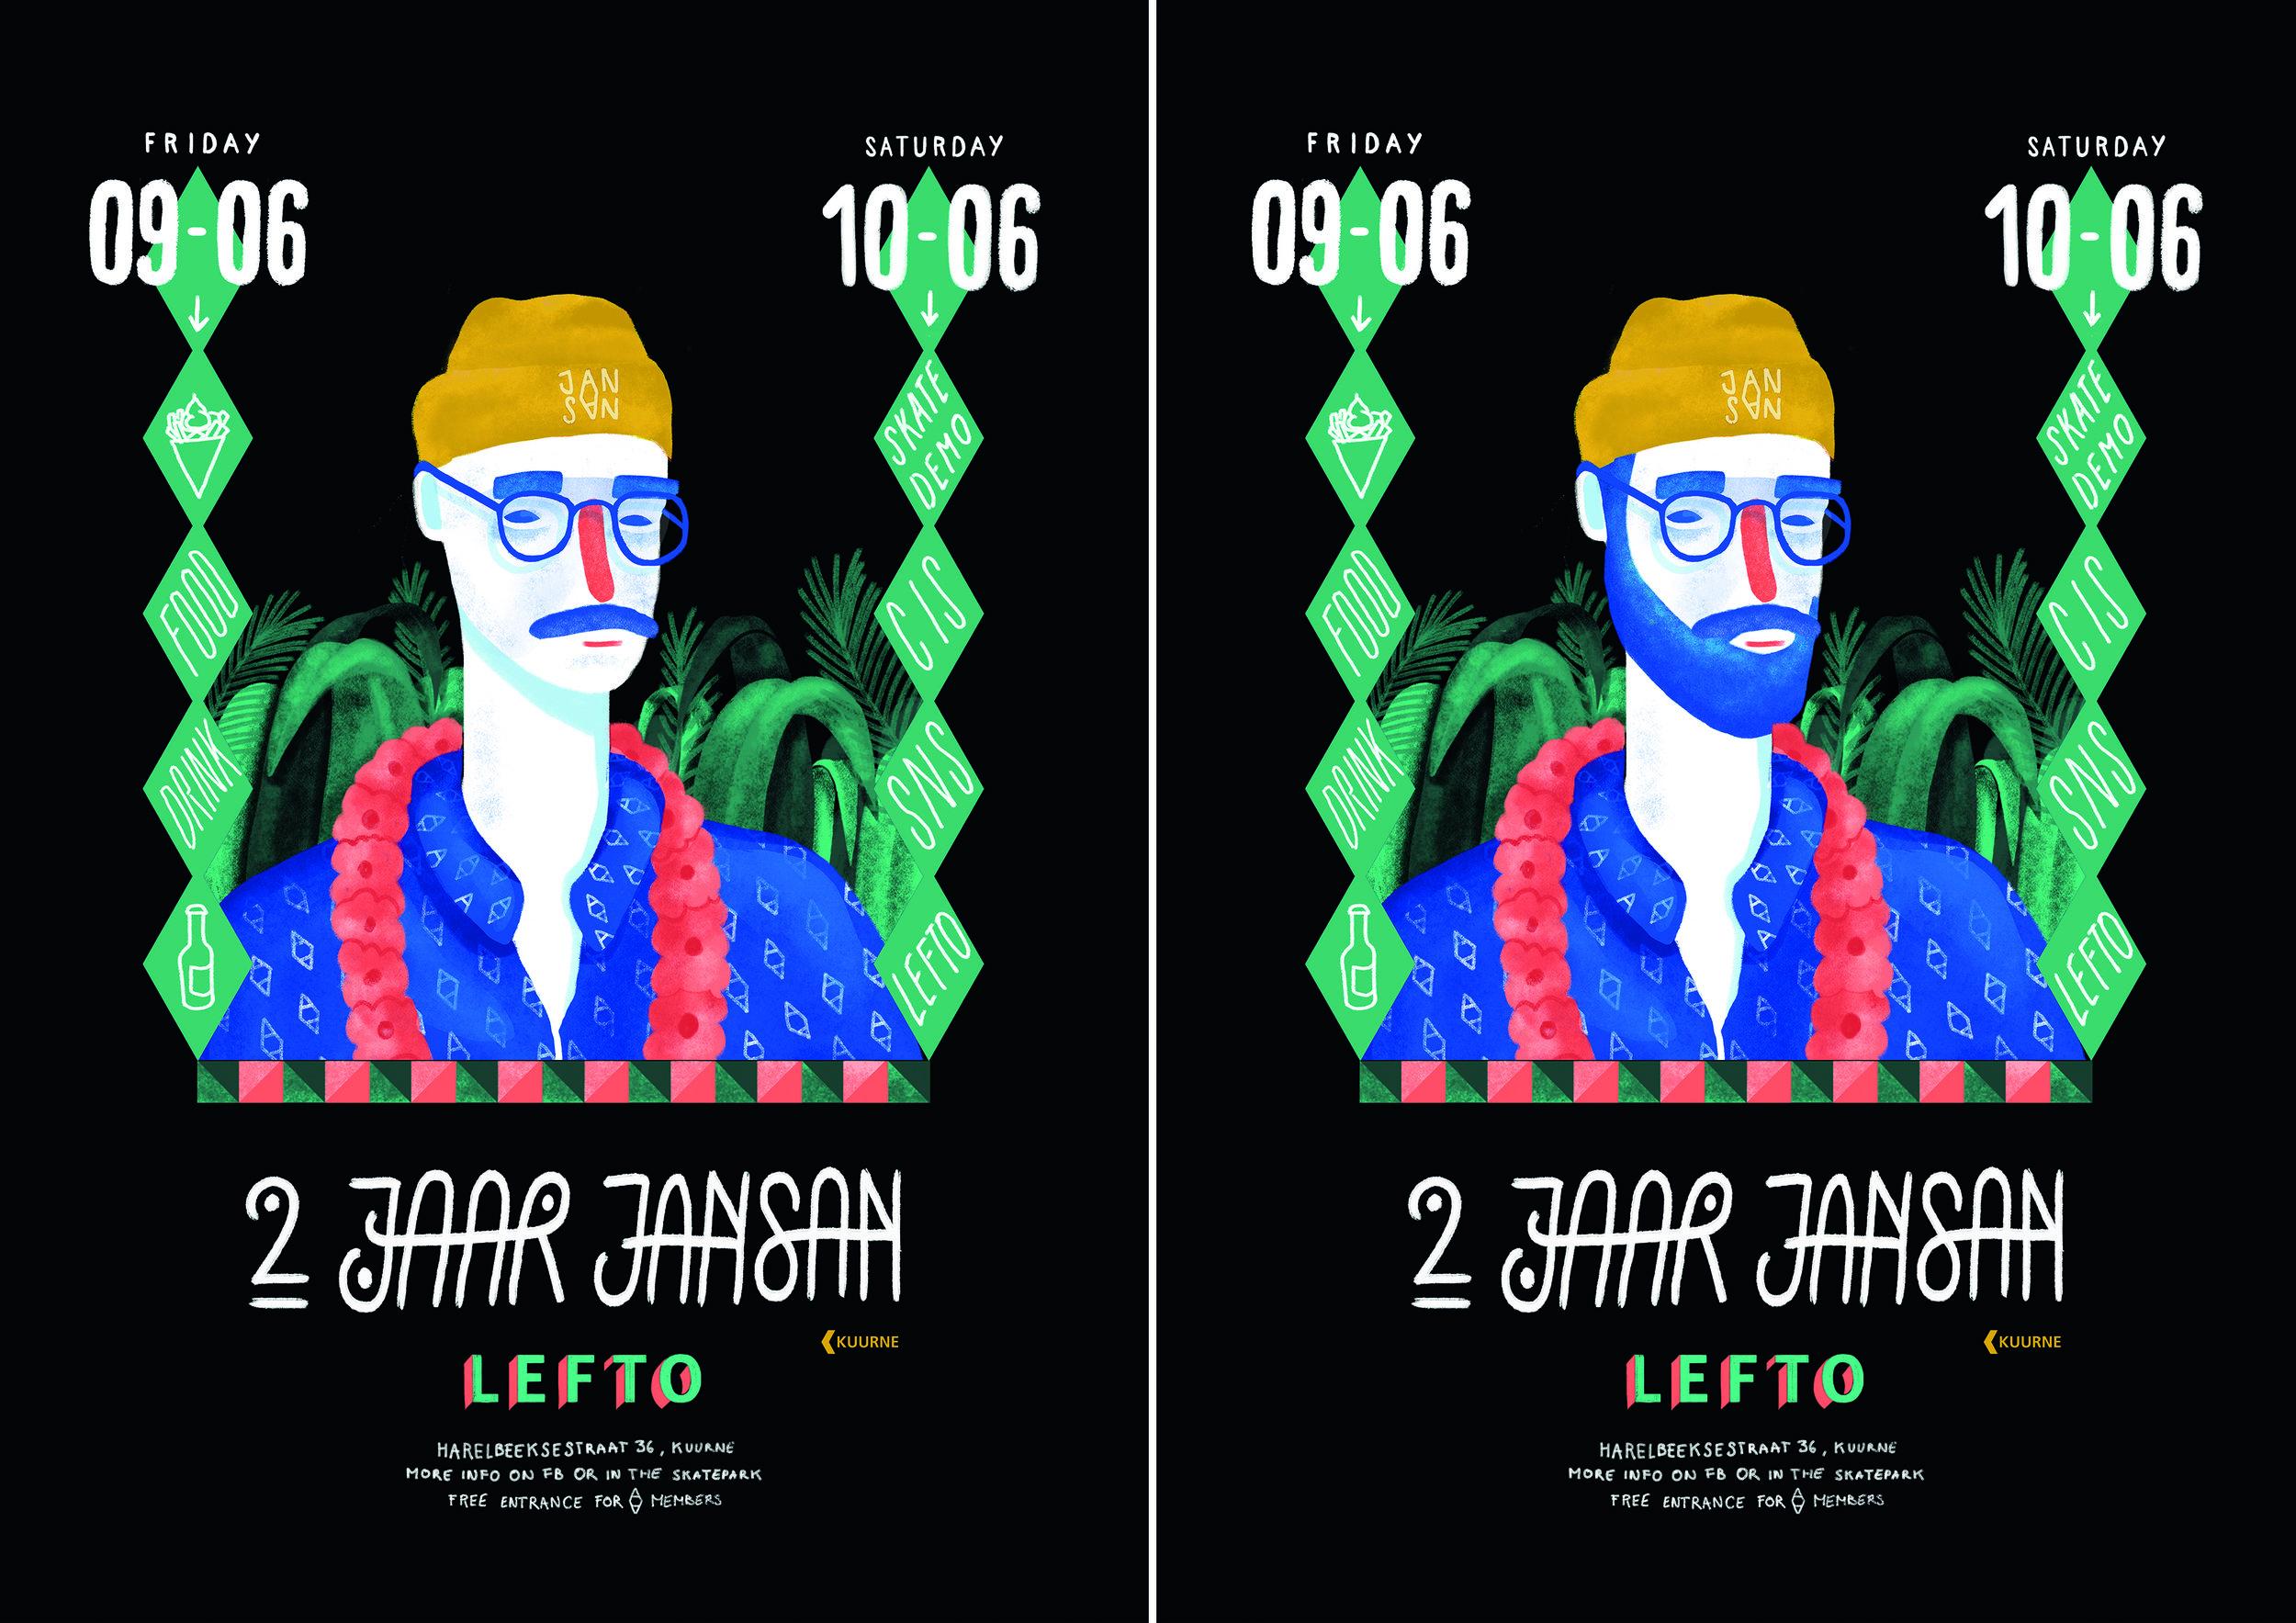 2 jaar jansan | Affiche A3 met baard en snor.jpg